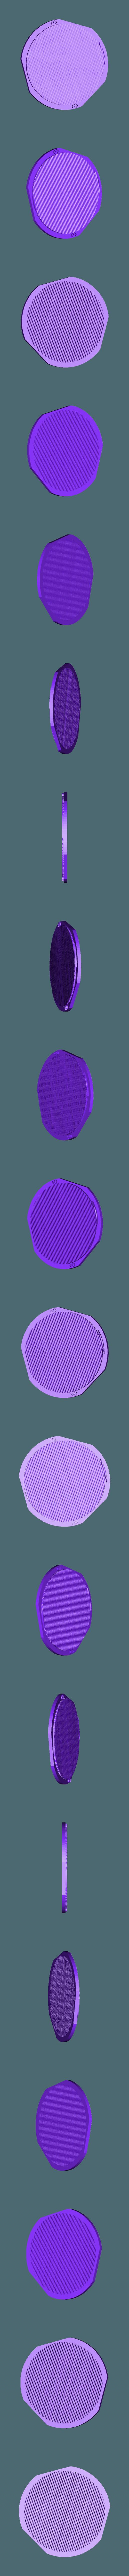 Rejilla_3.stl Download free STL file #3DvsCOVID19 Mask filters with side breathing • 3D printer object, alonsothander